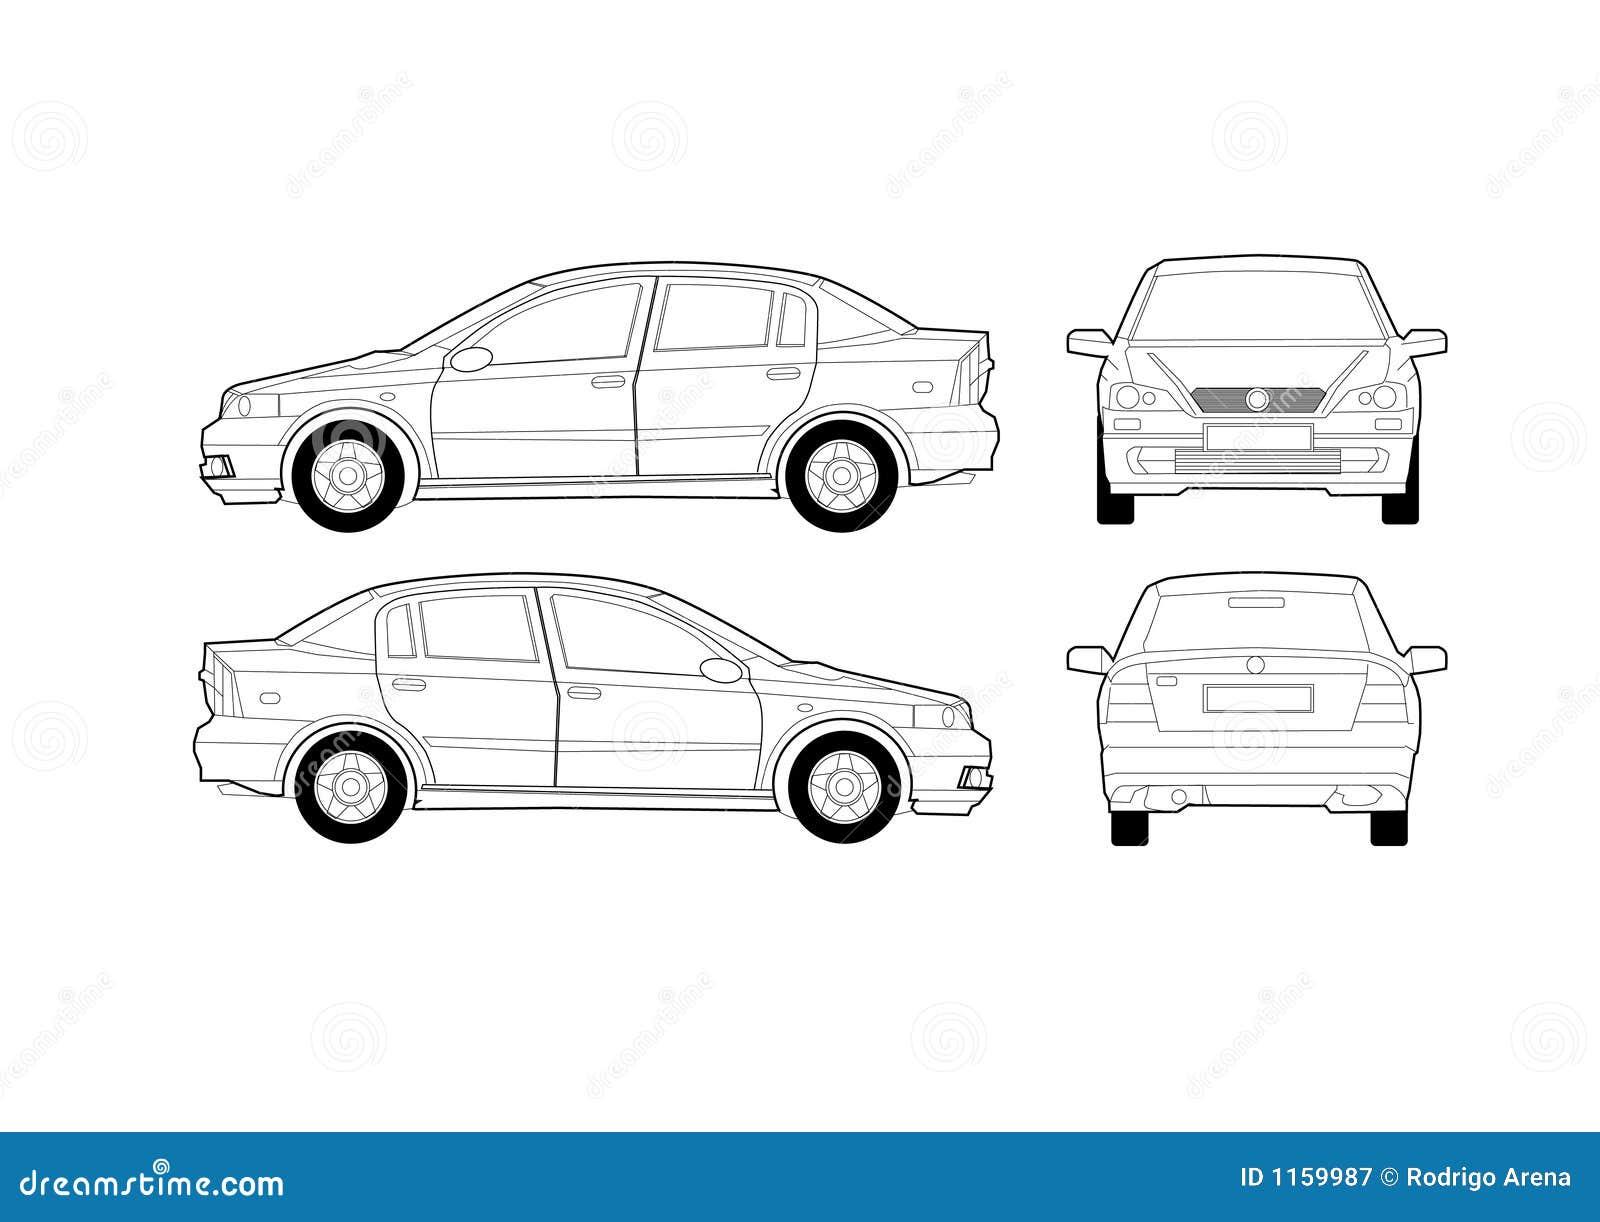 Beste Autos Diagramm Ideen - Elektrische Schaltplan-Ideen ...